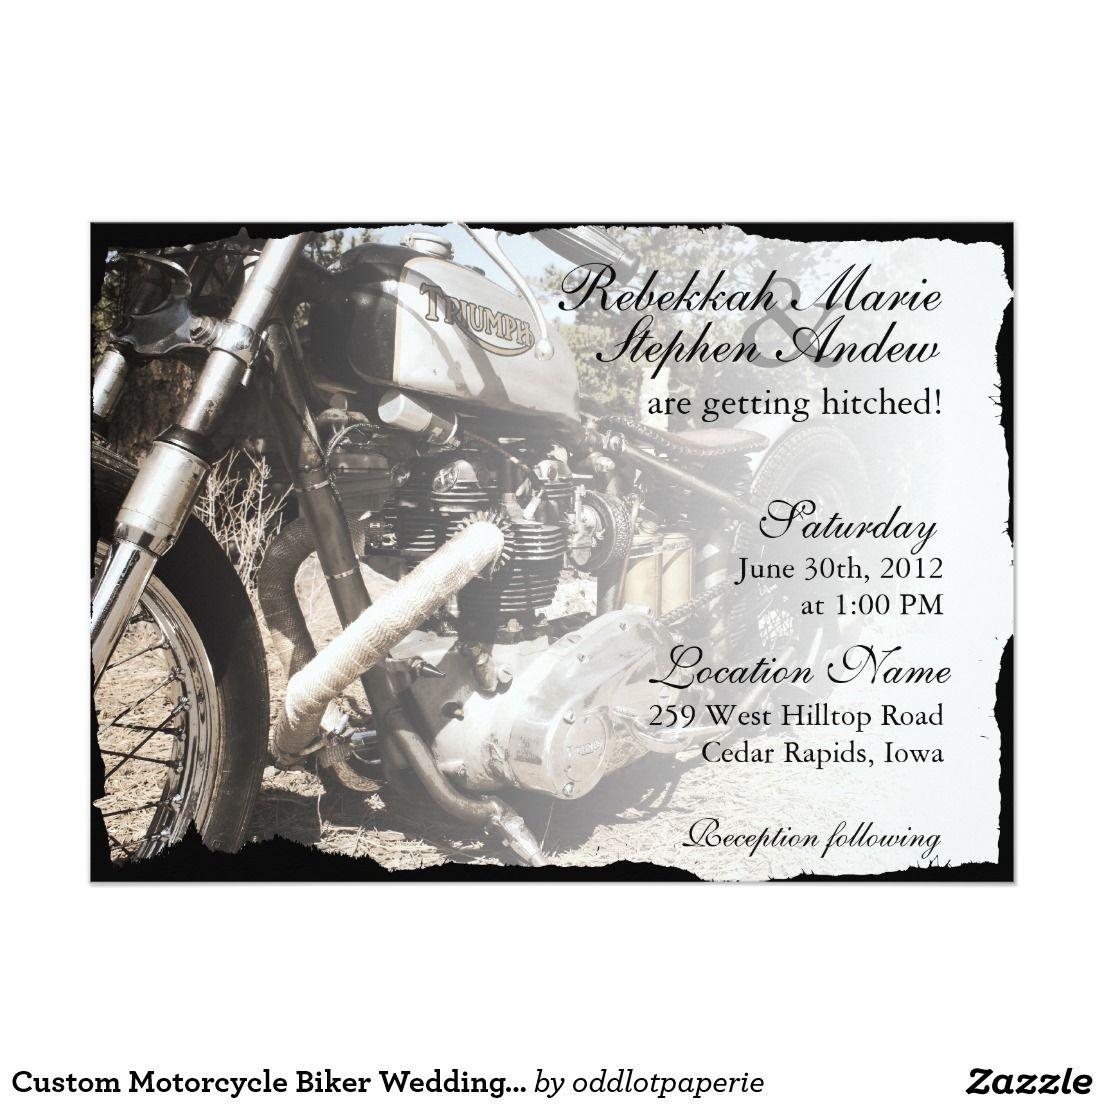 Custom Motorcycle Biker Wedding Invitation   Custom motorcycles ...